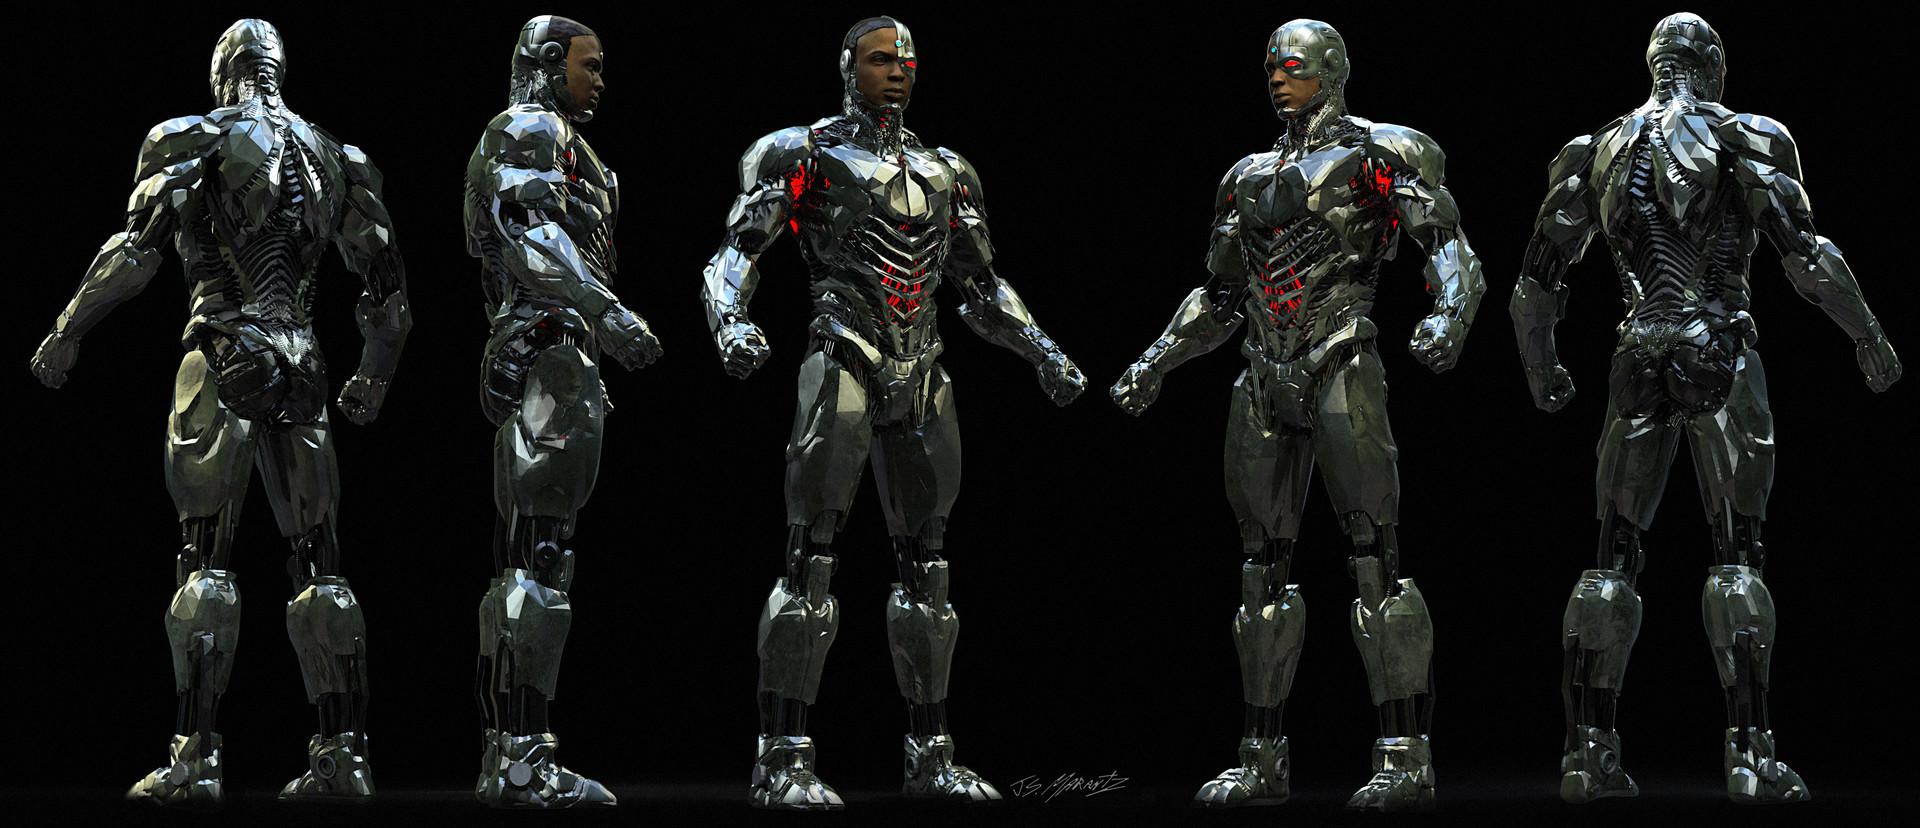 Jerx marantz cyborg ortho full 2